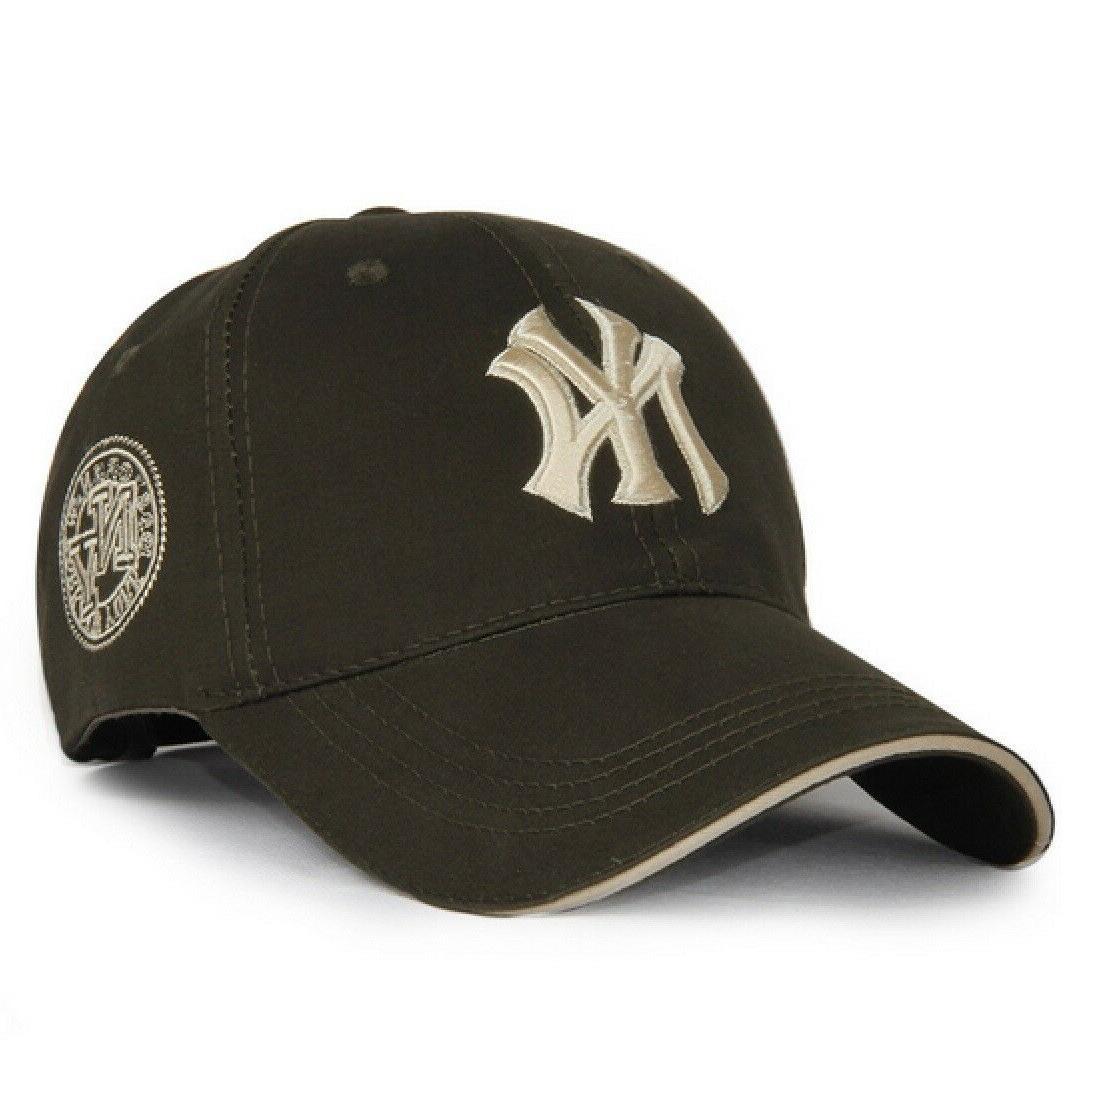 New York Yankees Adjustable Cap Men Women